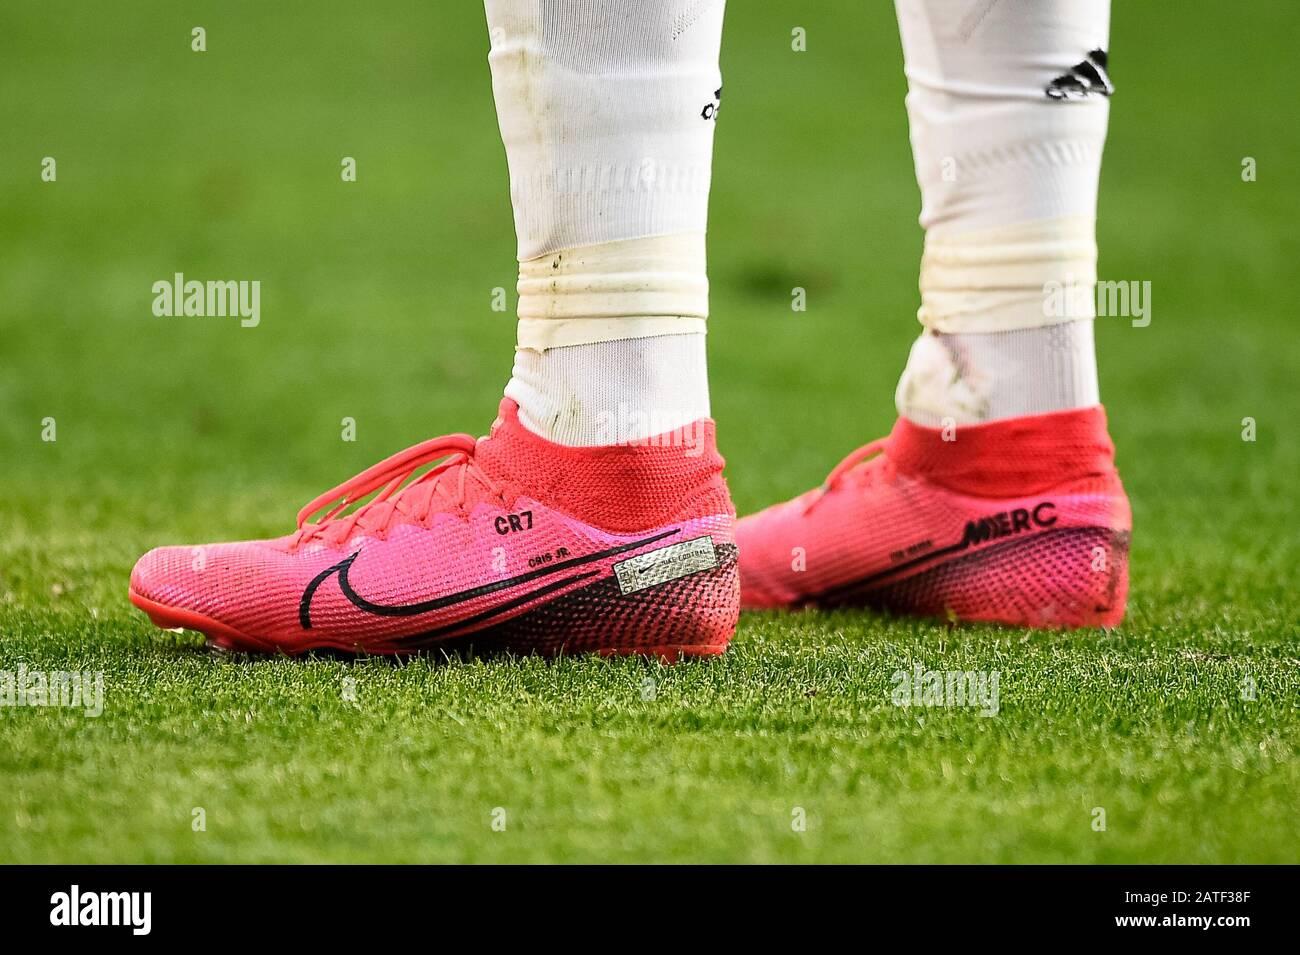 Cristiano Ronaldo Boots Stock Photos Cristiano Ronaldo Boots